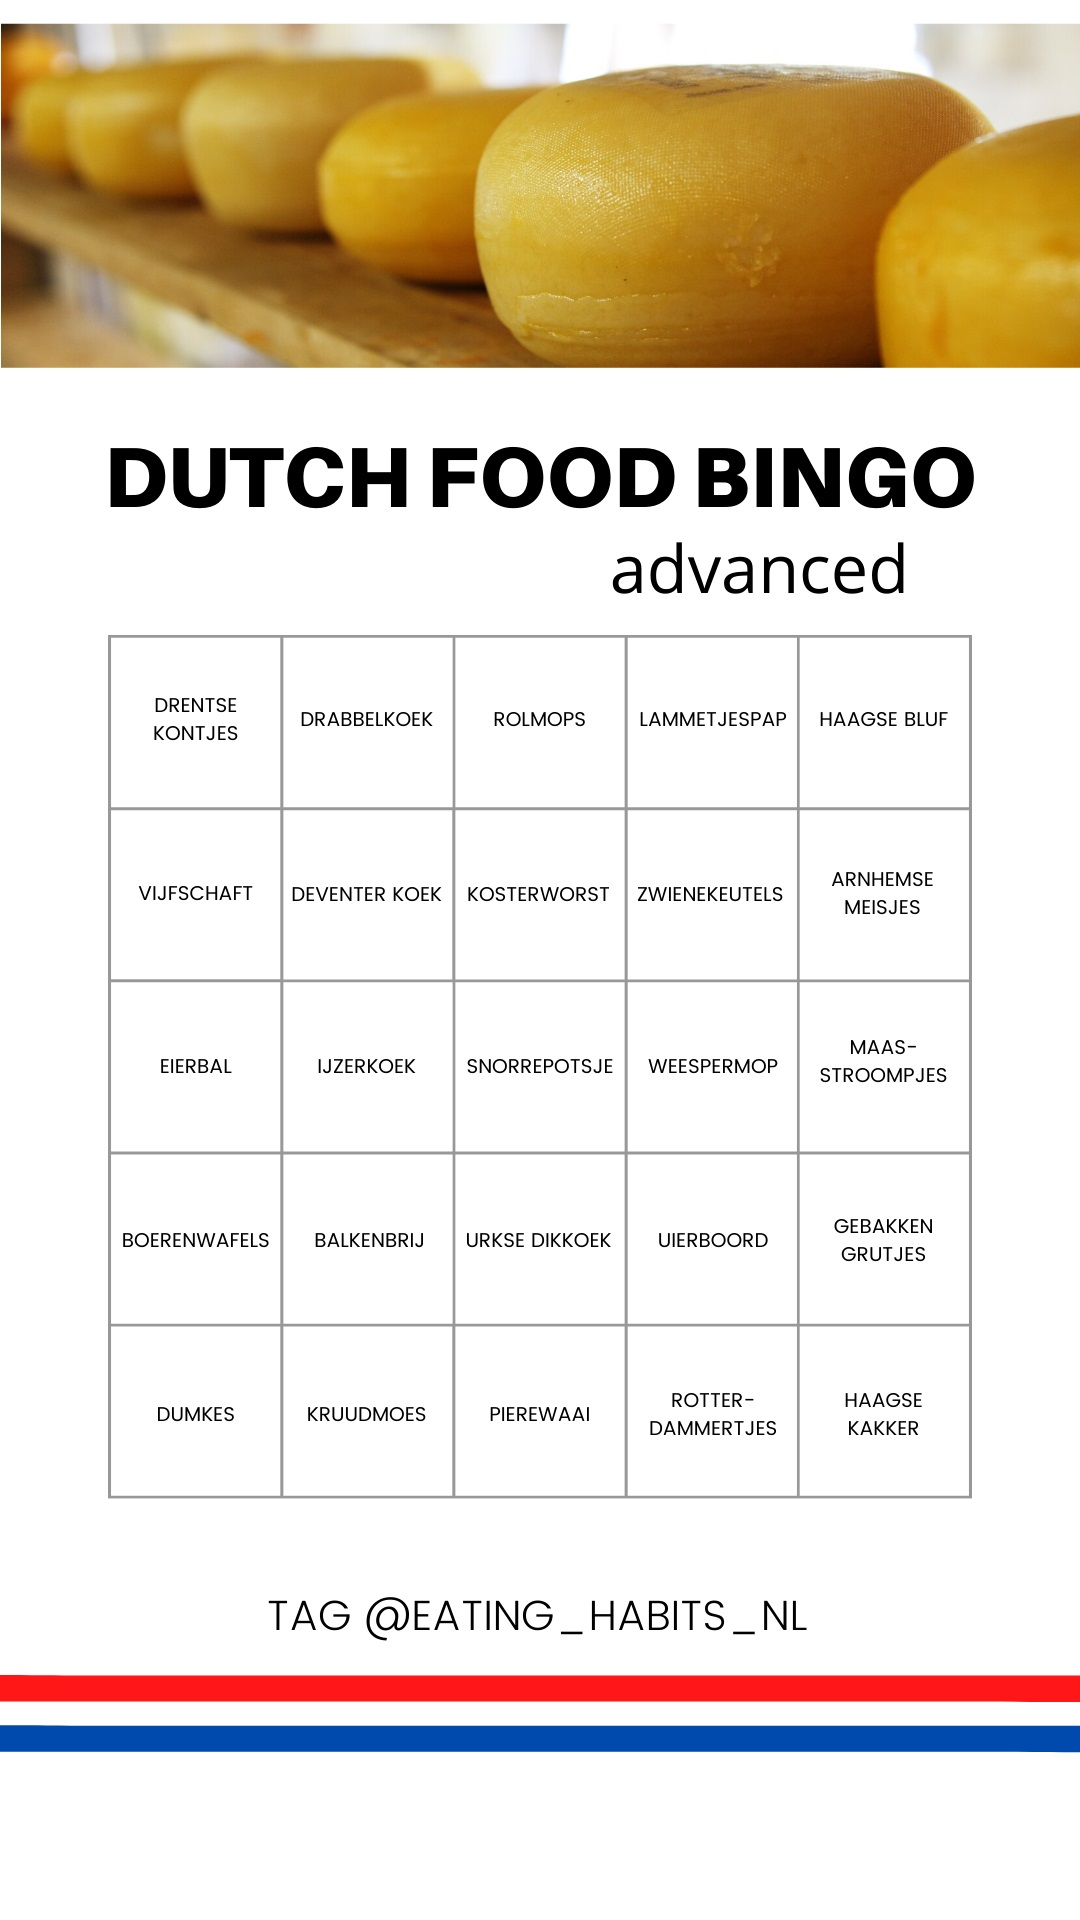 Dutch food bingo advanced - Eating Habits